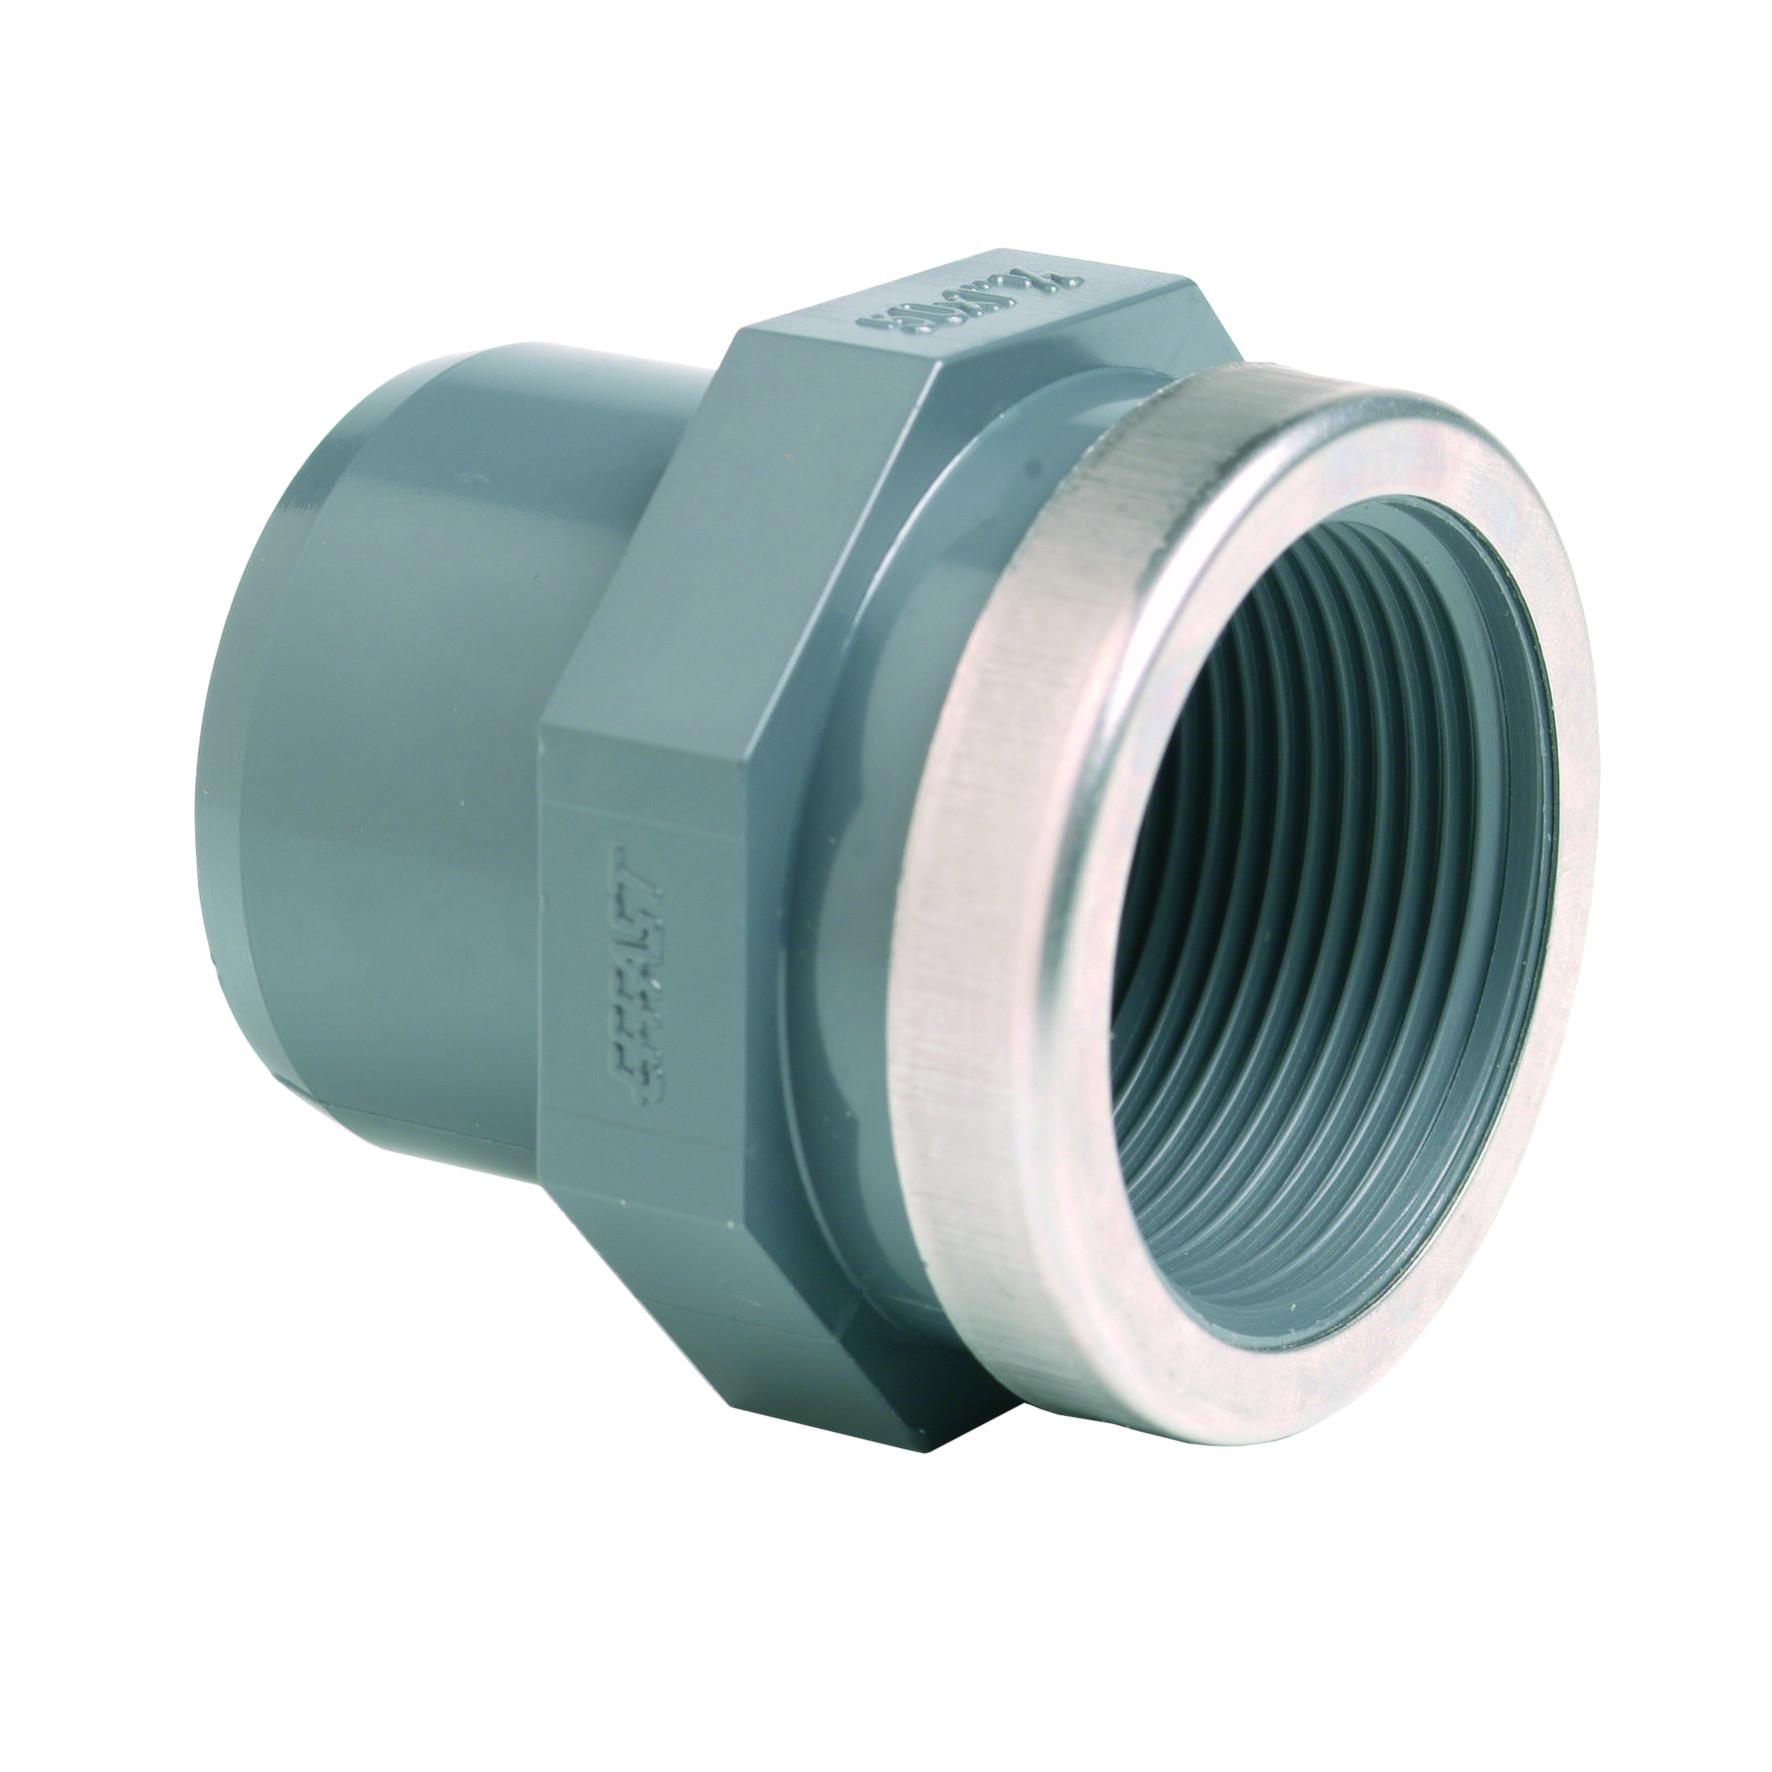 PVC-U adattatore femmina - EFFAST - 100% Made in Italy